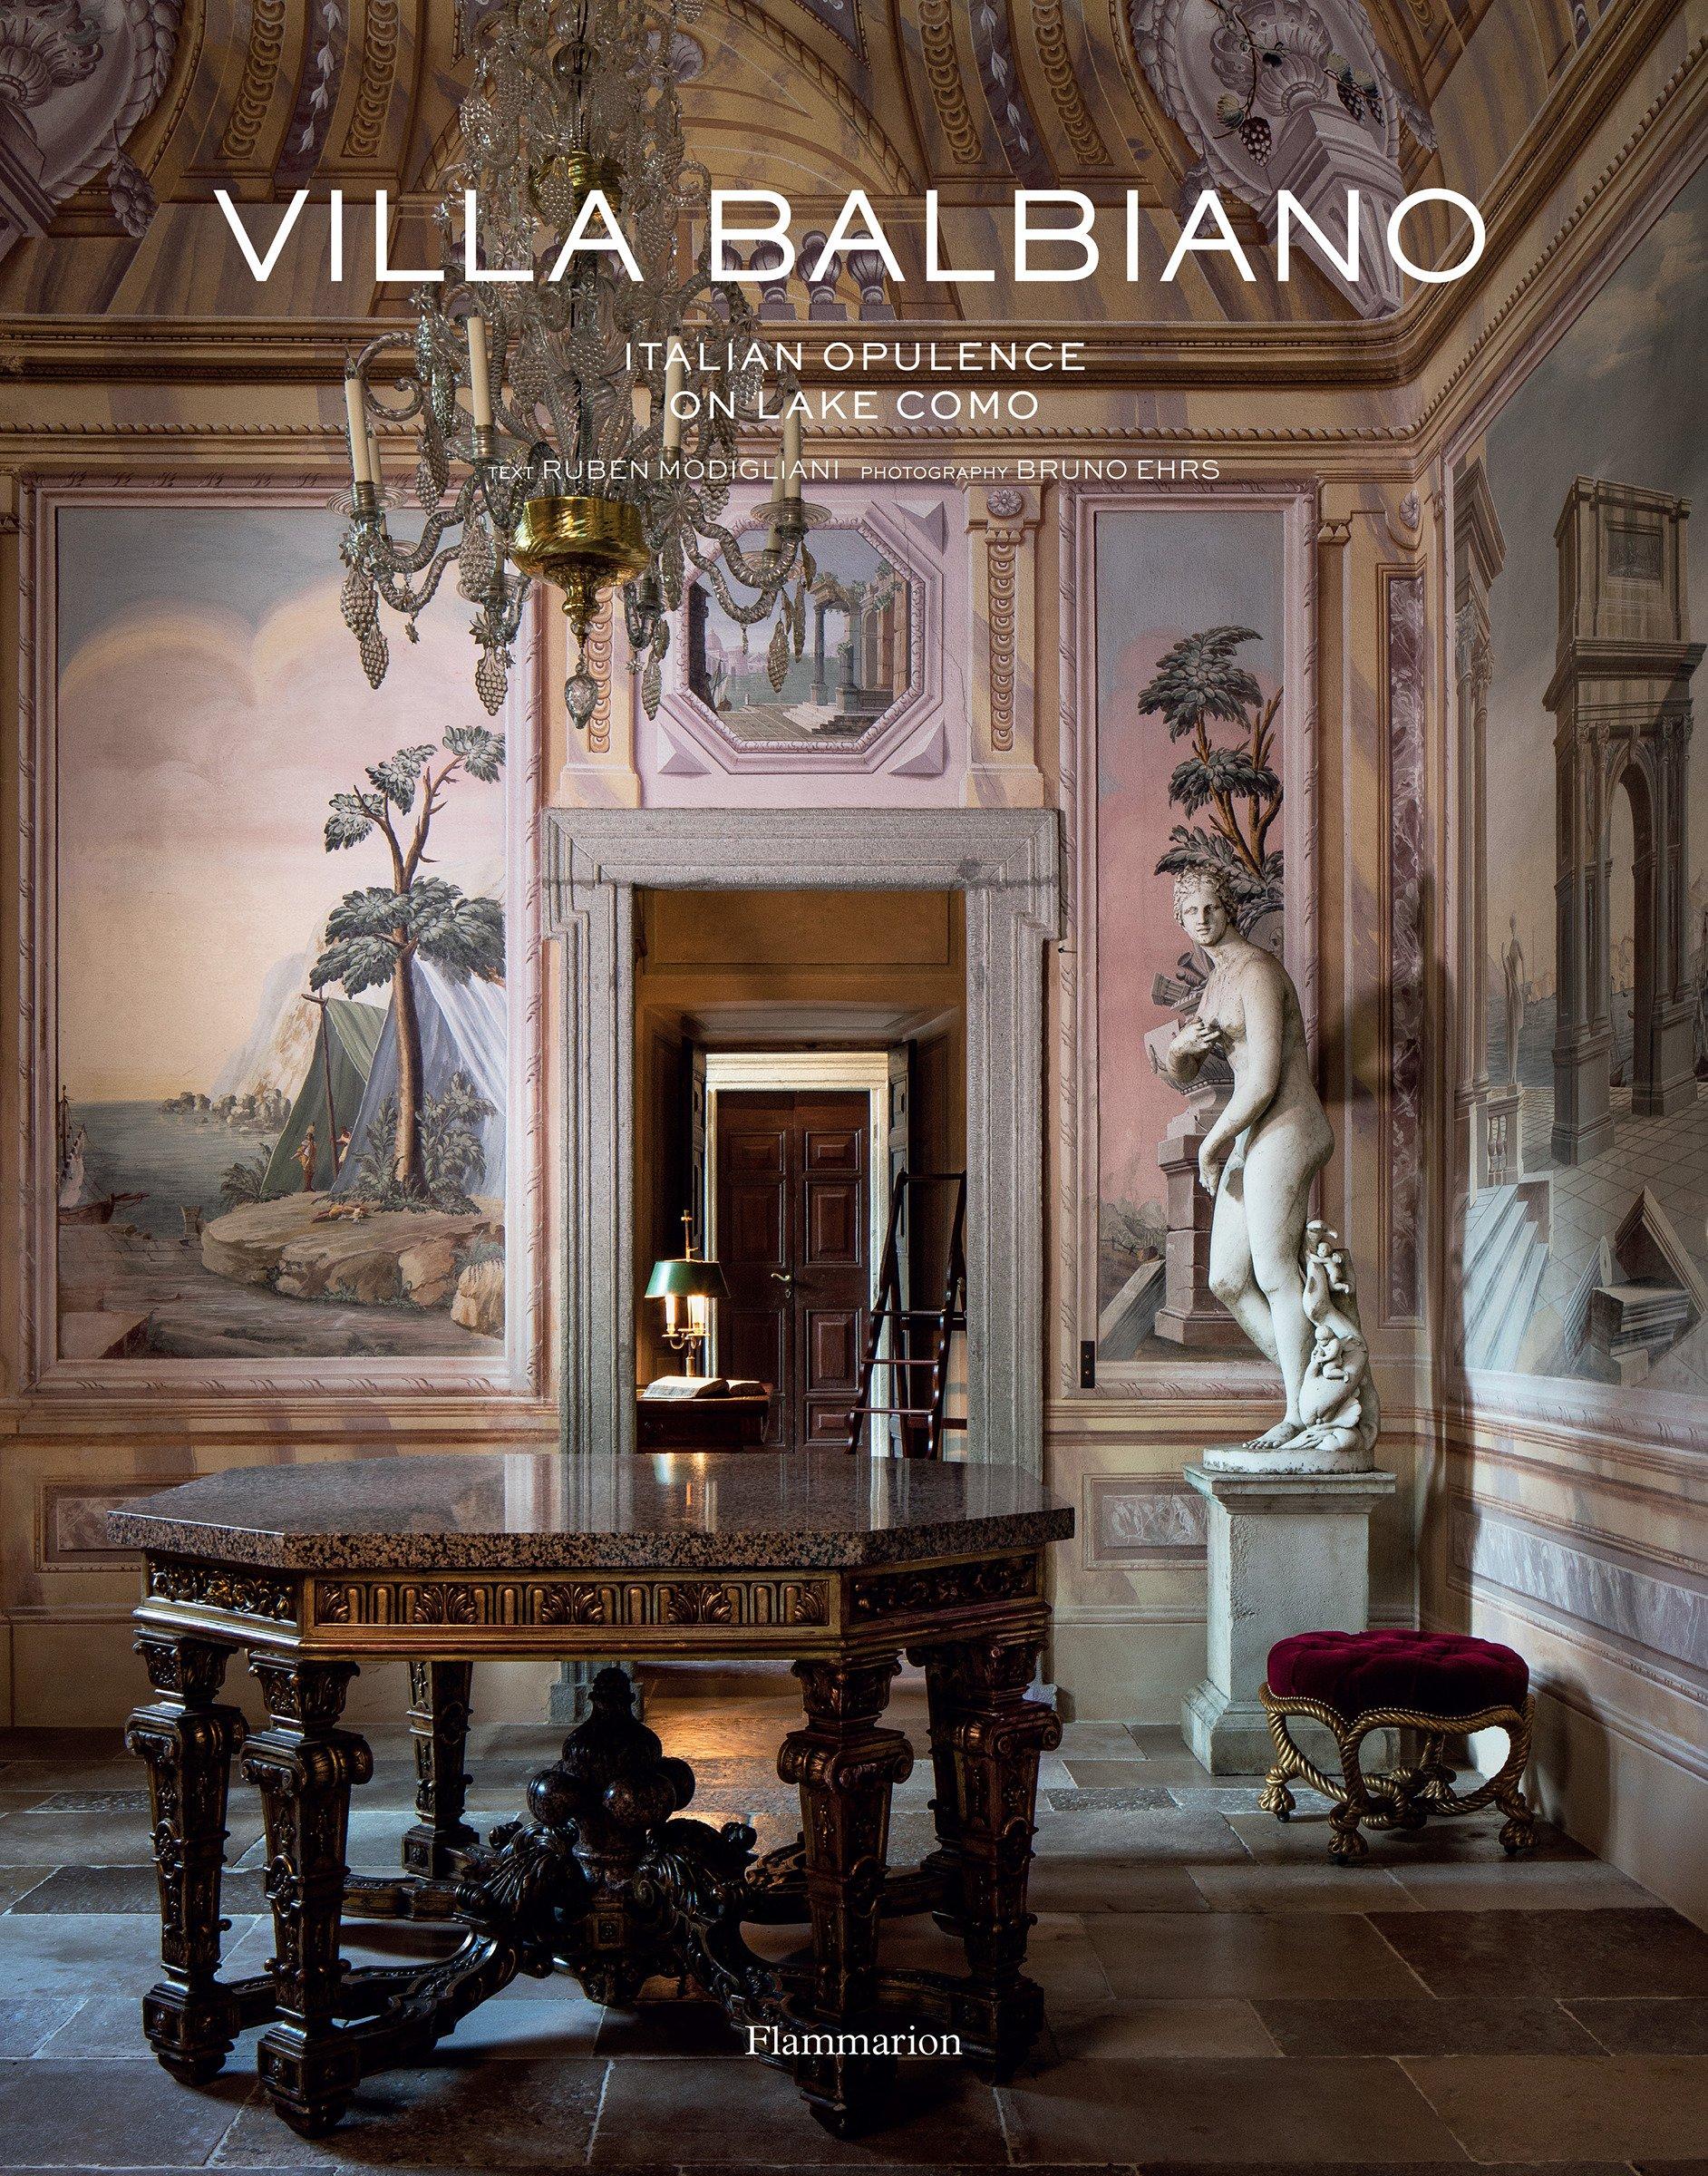 Villa Balbiano: Italian Opulence on Lake Como